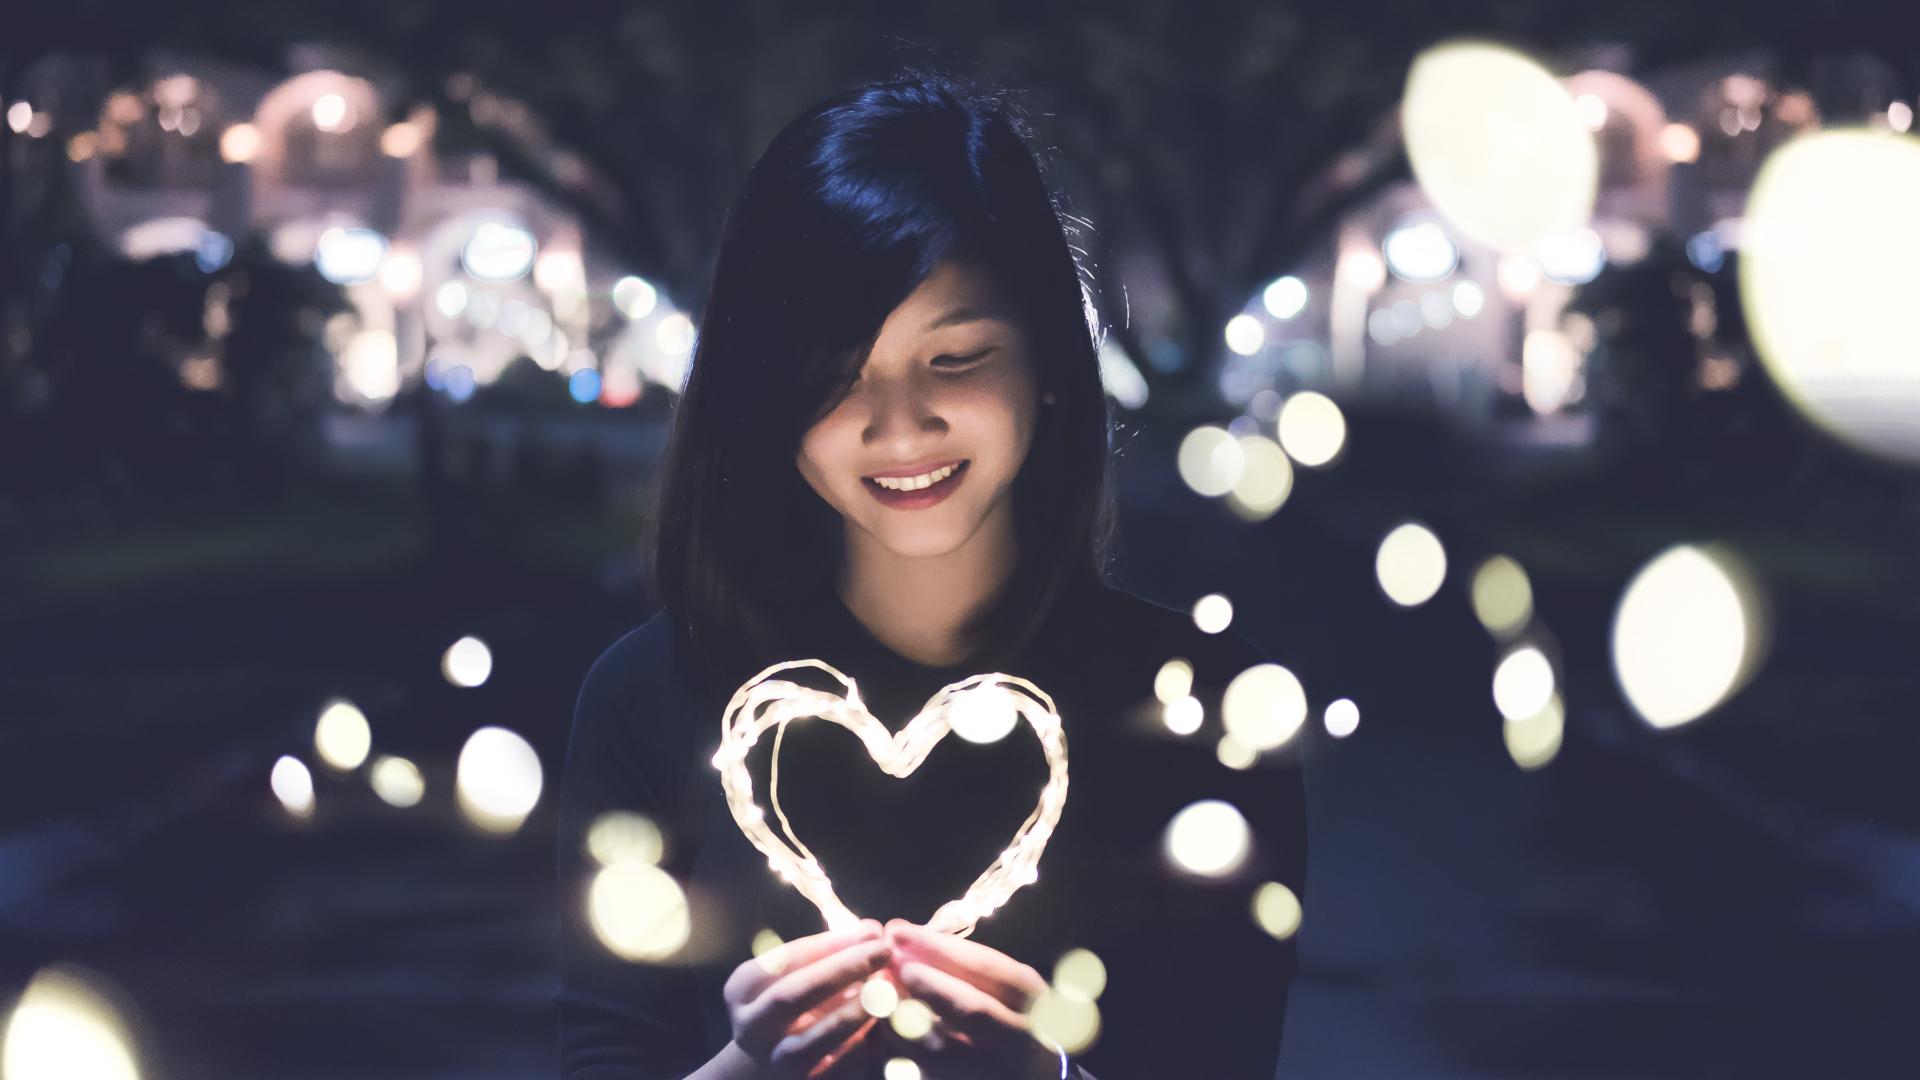 People 1920x1080 Japanese women heart lights smiling women urban women outdoors Asian